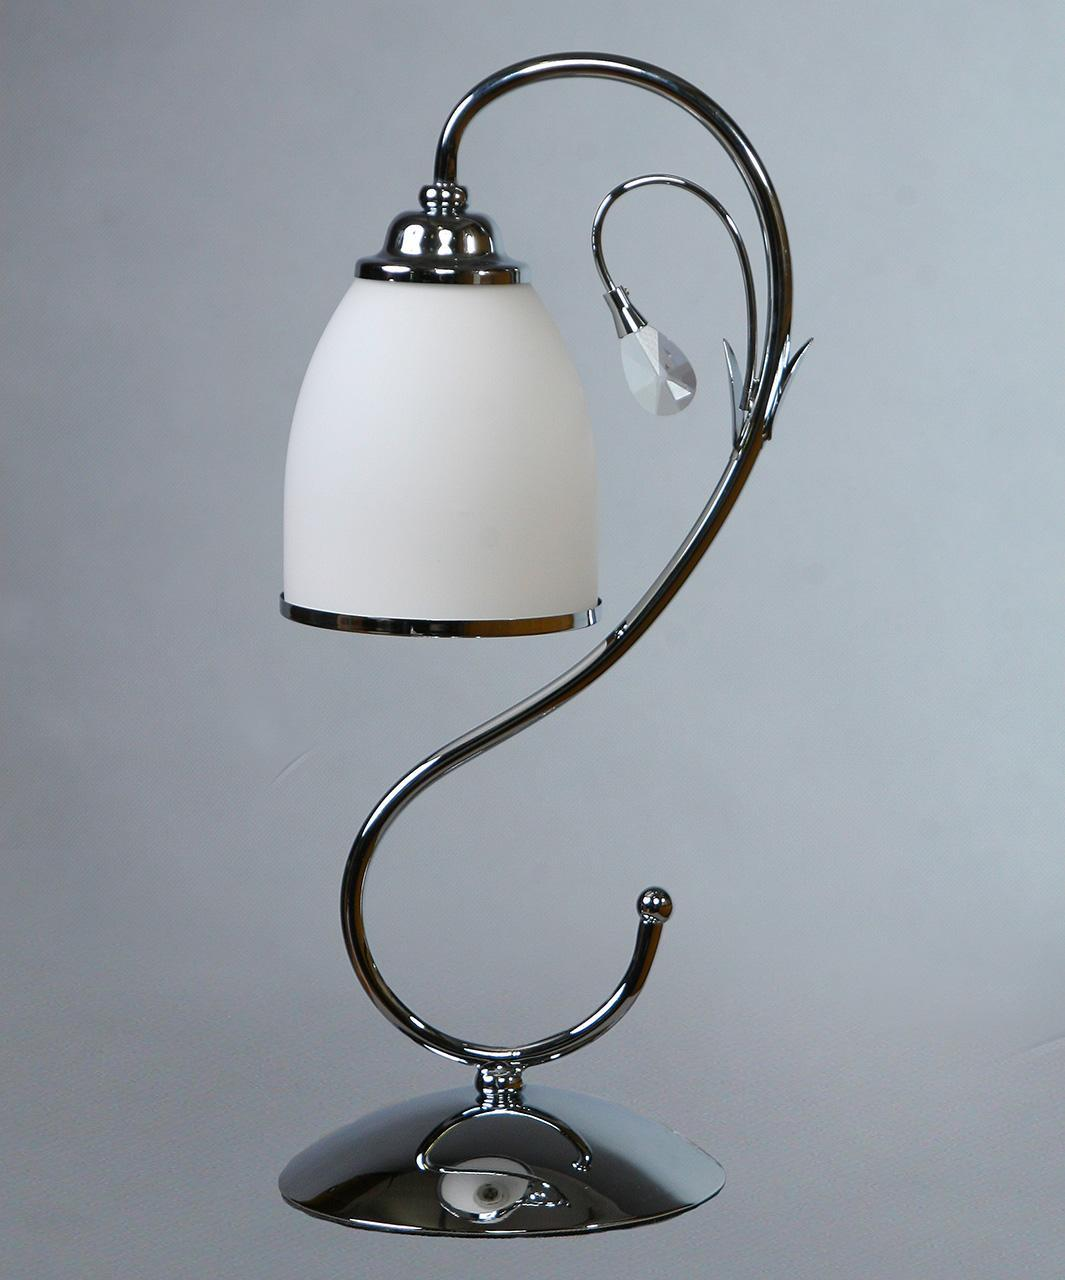 Настольная лампа Brizzi Tarragona MA 02640Т/001 Chrome недорго, оригинальная цена